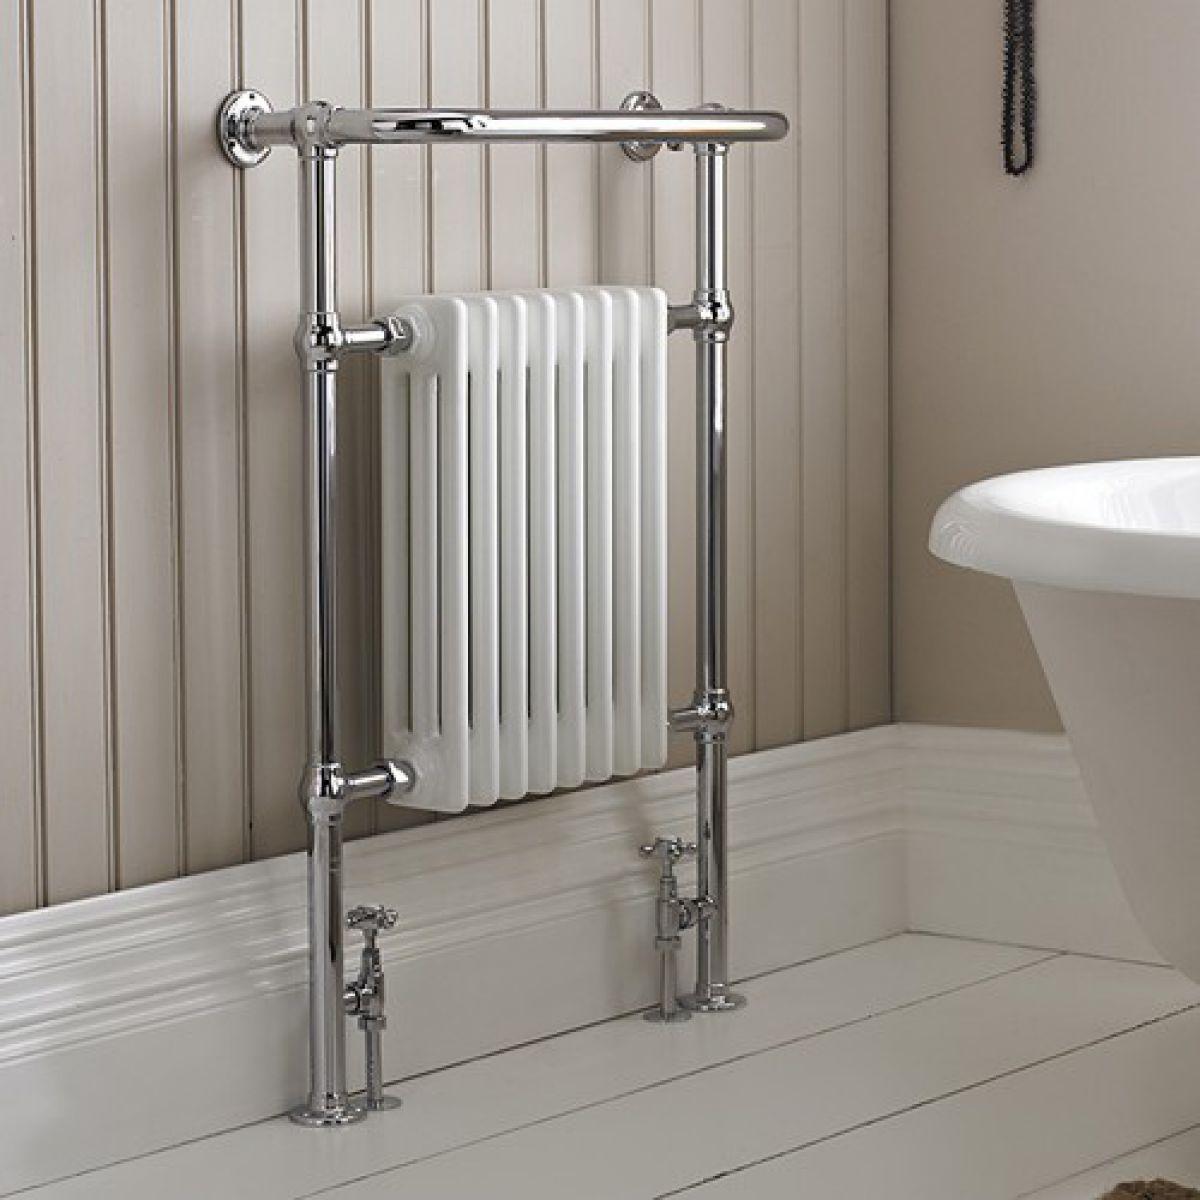 Burlington Trafalgar Towel Warming Radiator Set R1chr R6chr Uk Bathrooms